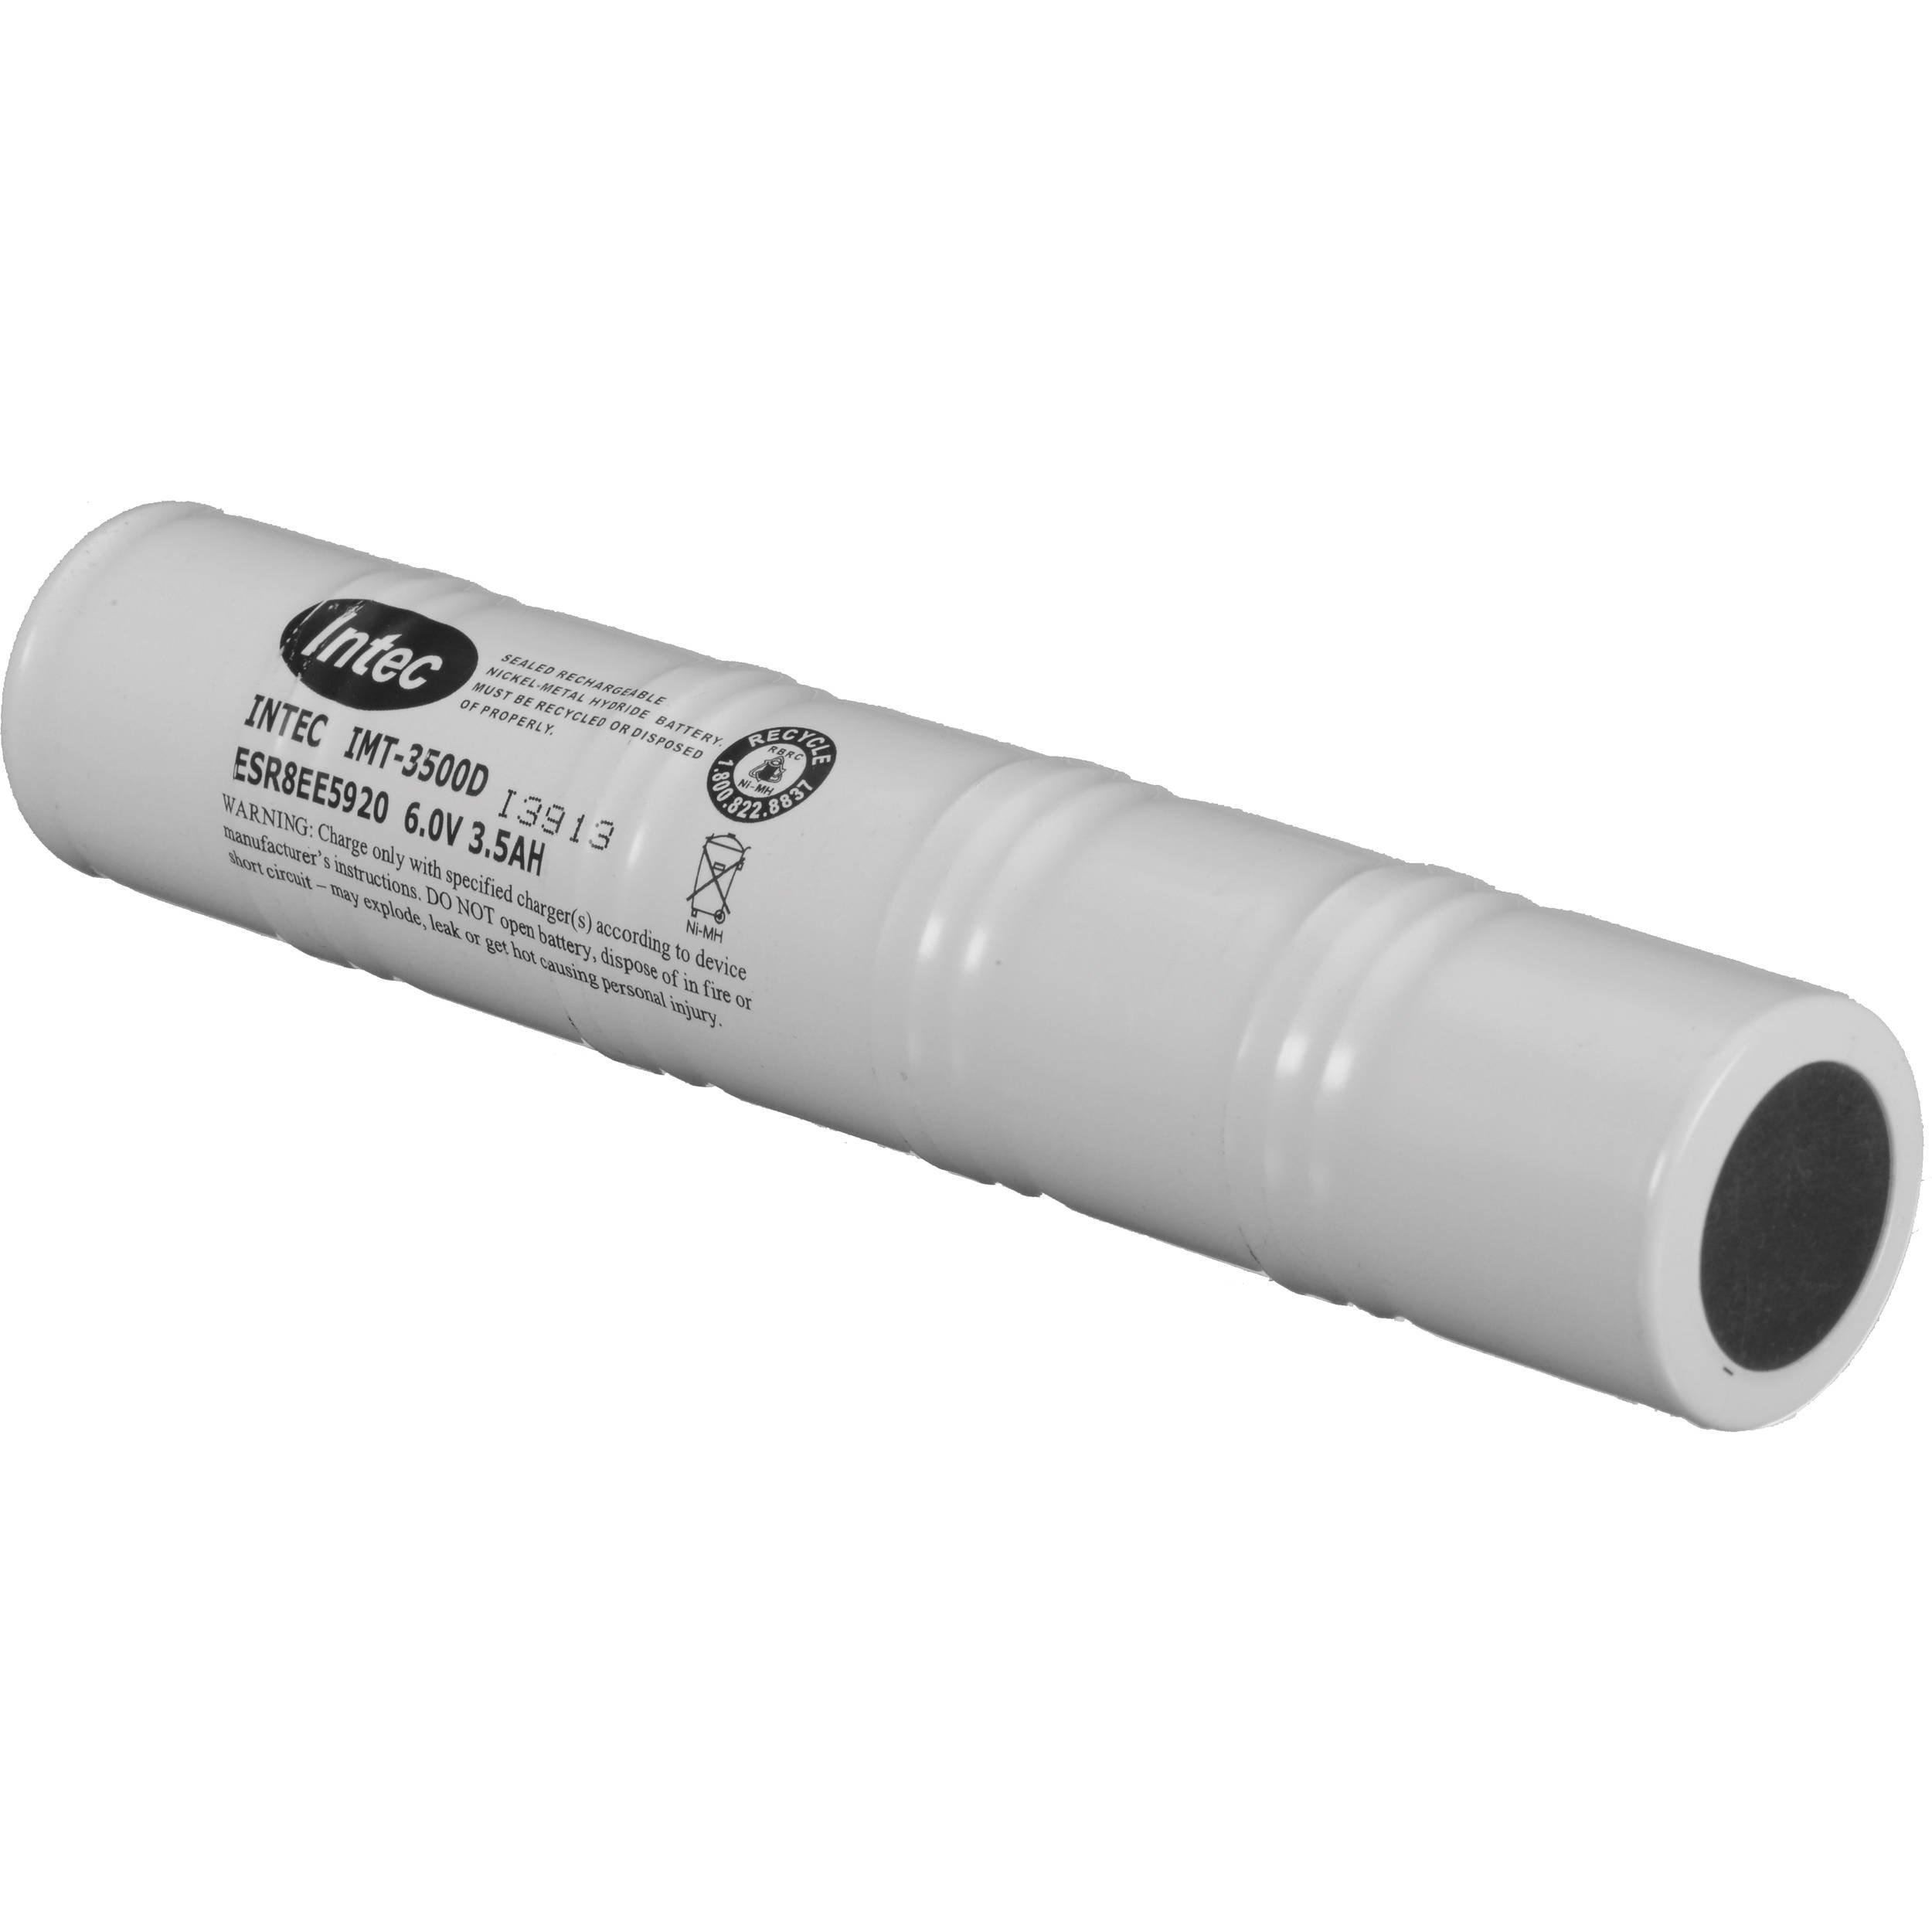 Bateria Maglite : 1 X 6 Volt Nimh Para Mag Charger Arxx235